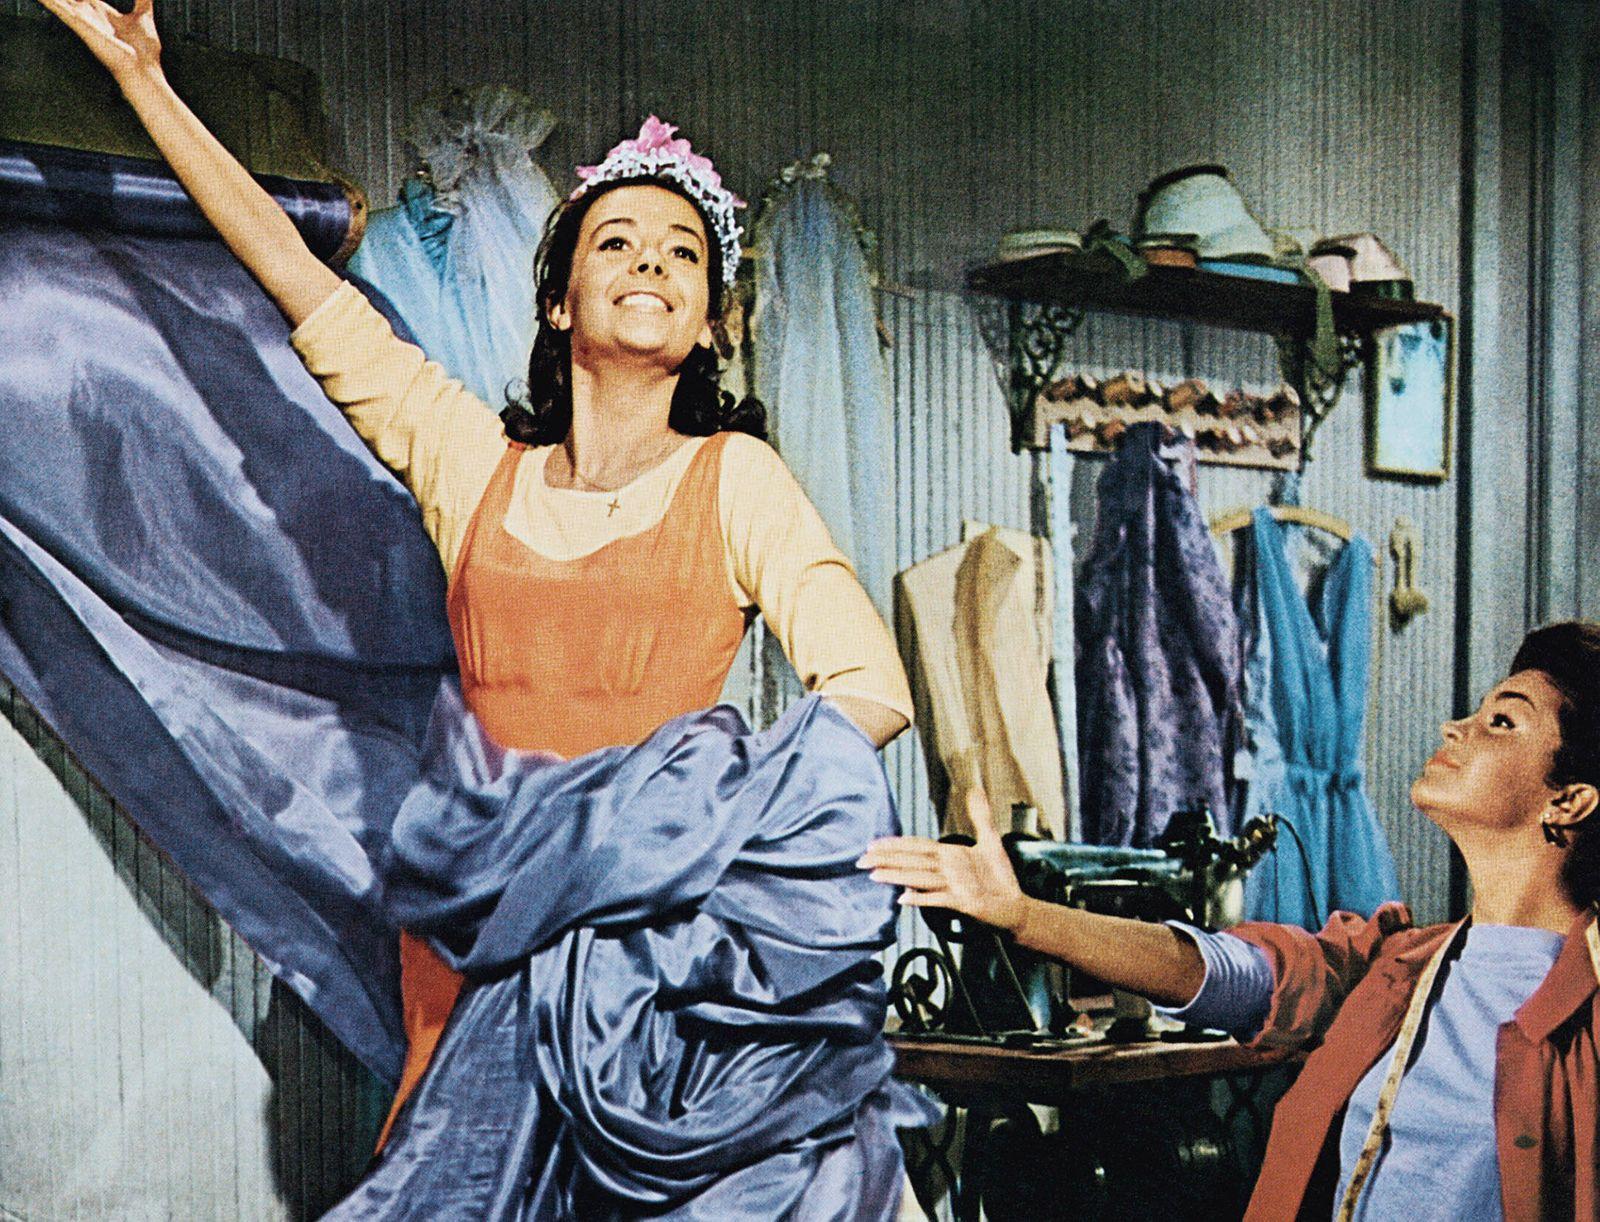 WEST SIDE STORY, Natalie Wood (left), 1961 Courtesy Everett Collection PUBLICATIONxINxGERxSUIxAUTxONLY Copyright: xCourt